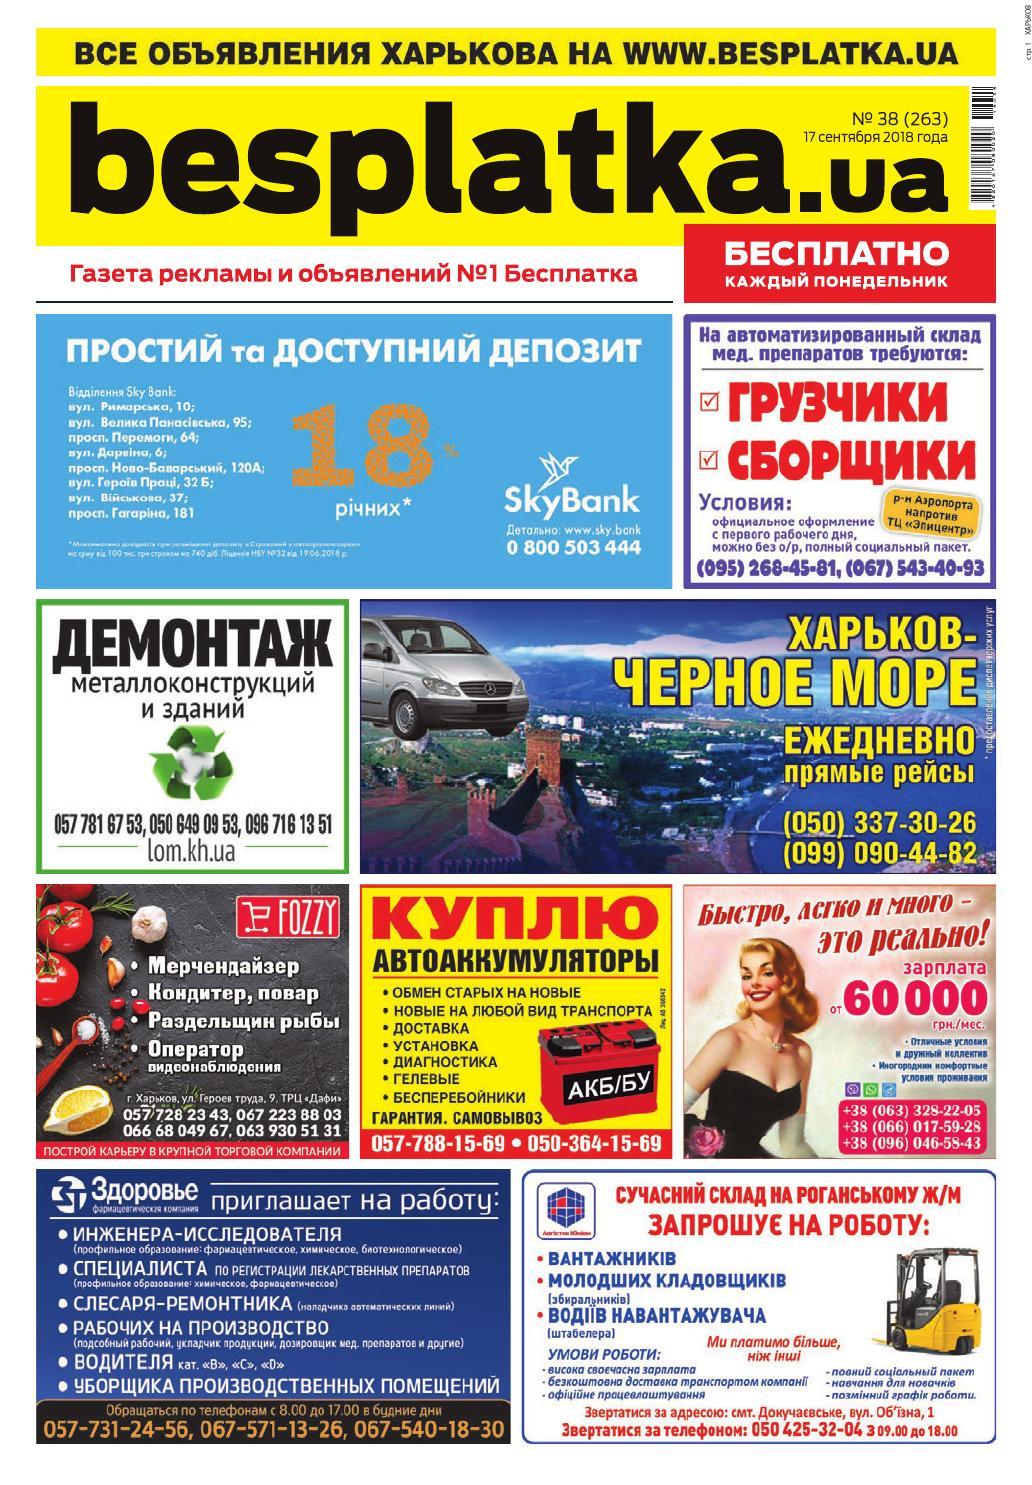 ff5296d36 Besplatka #38 Харьков by besplatka ukraine - issuu